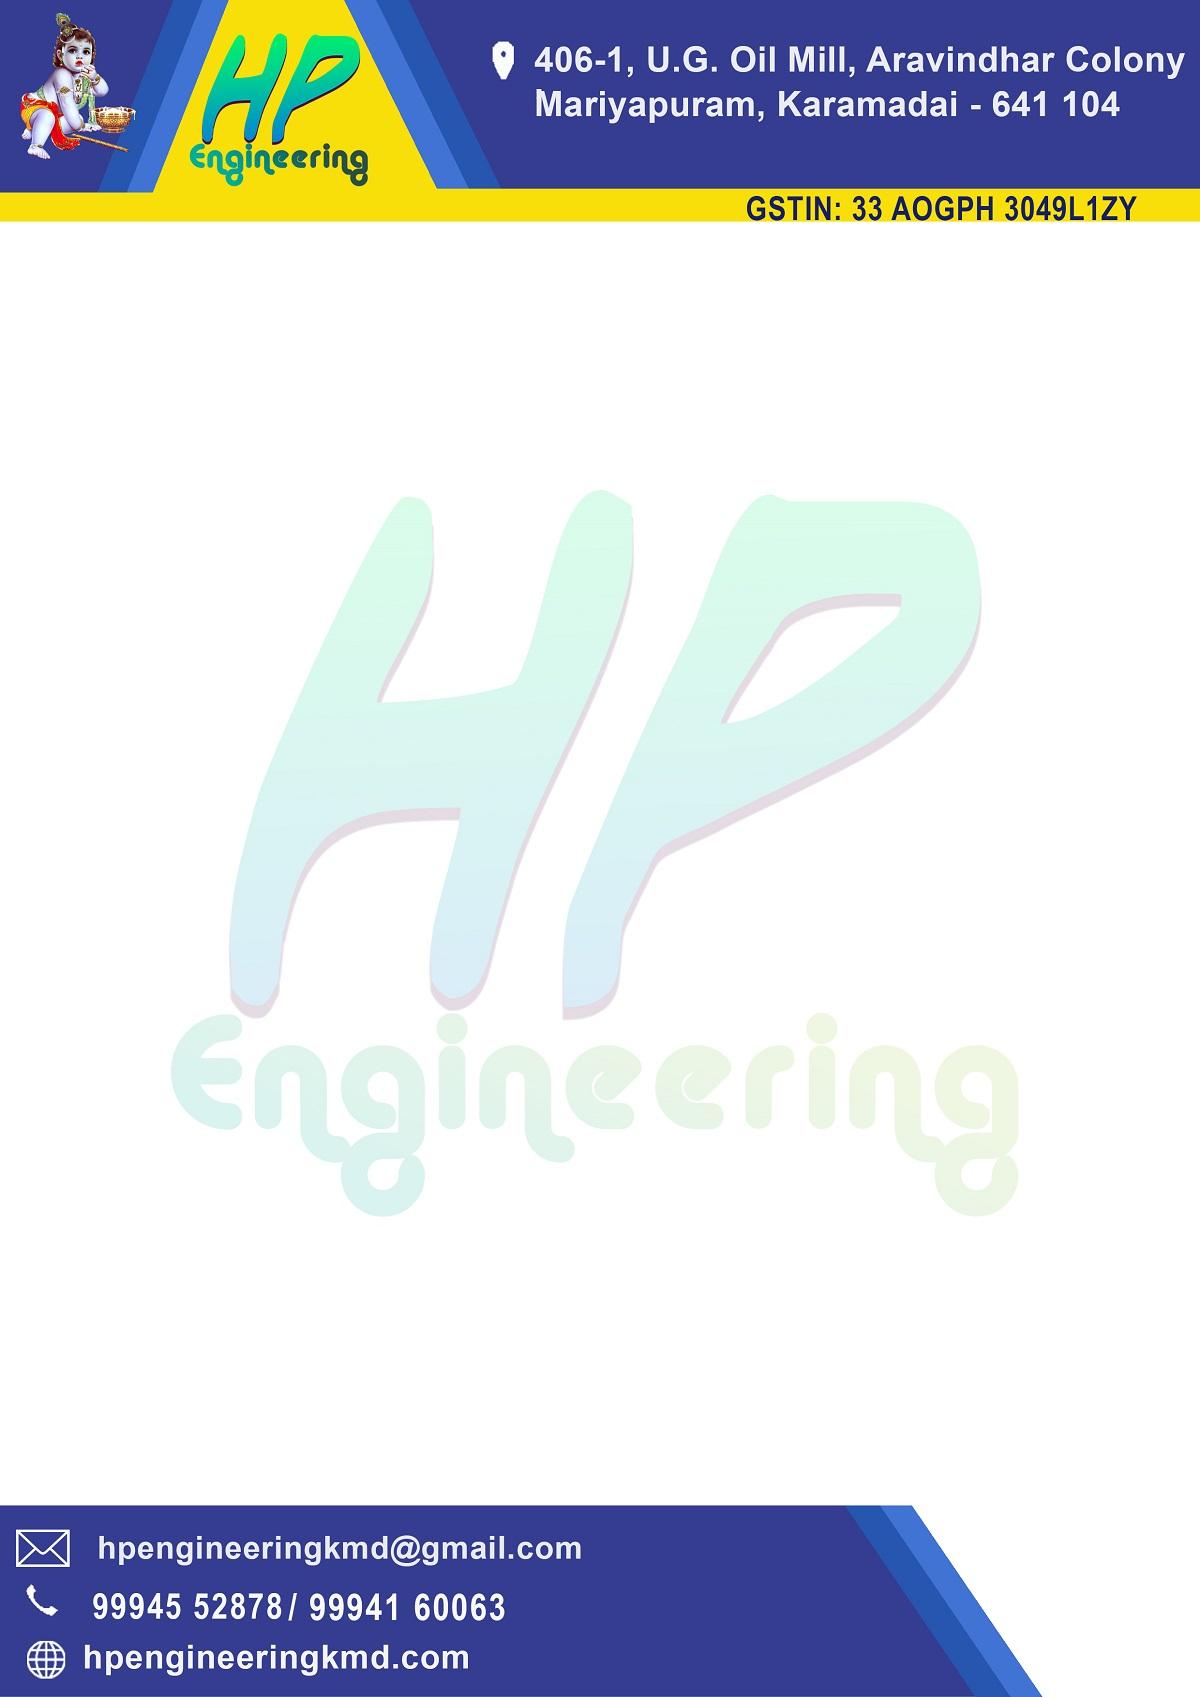 HP engineering Letter head